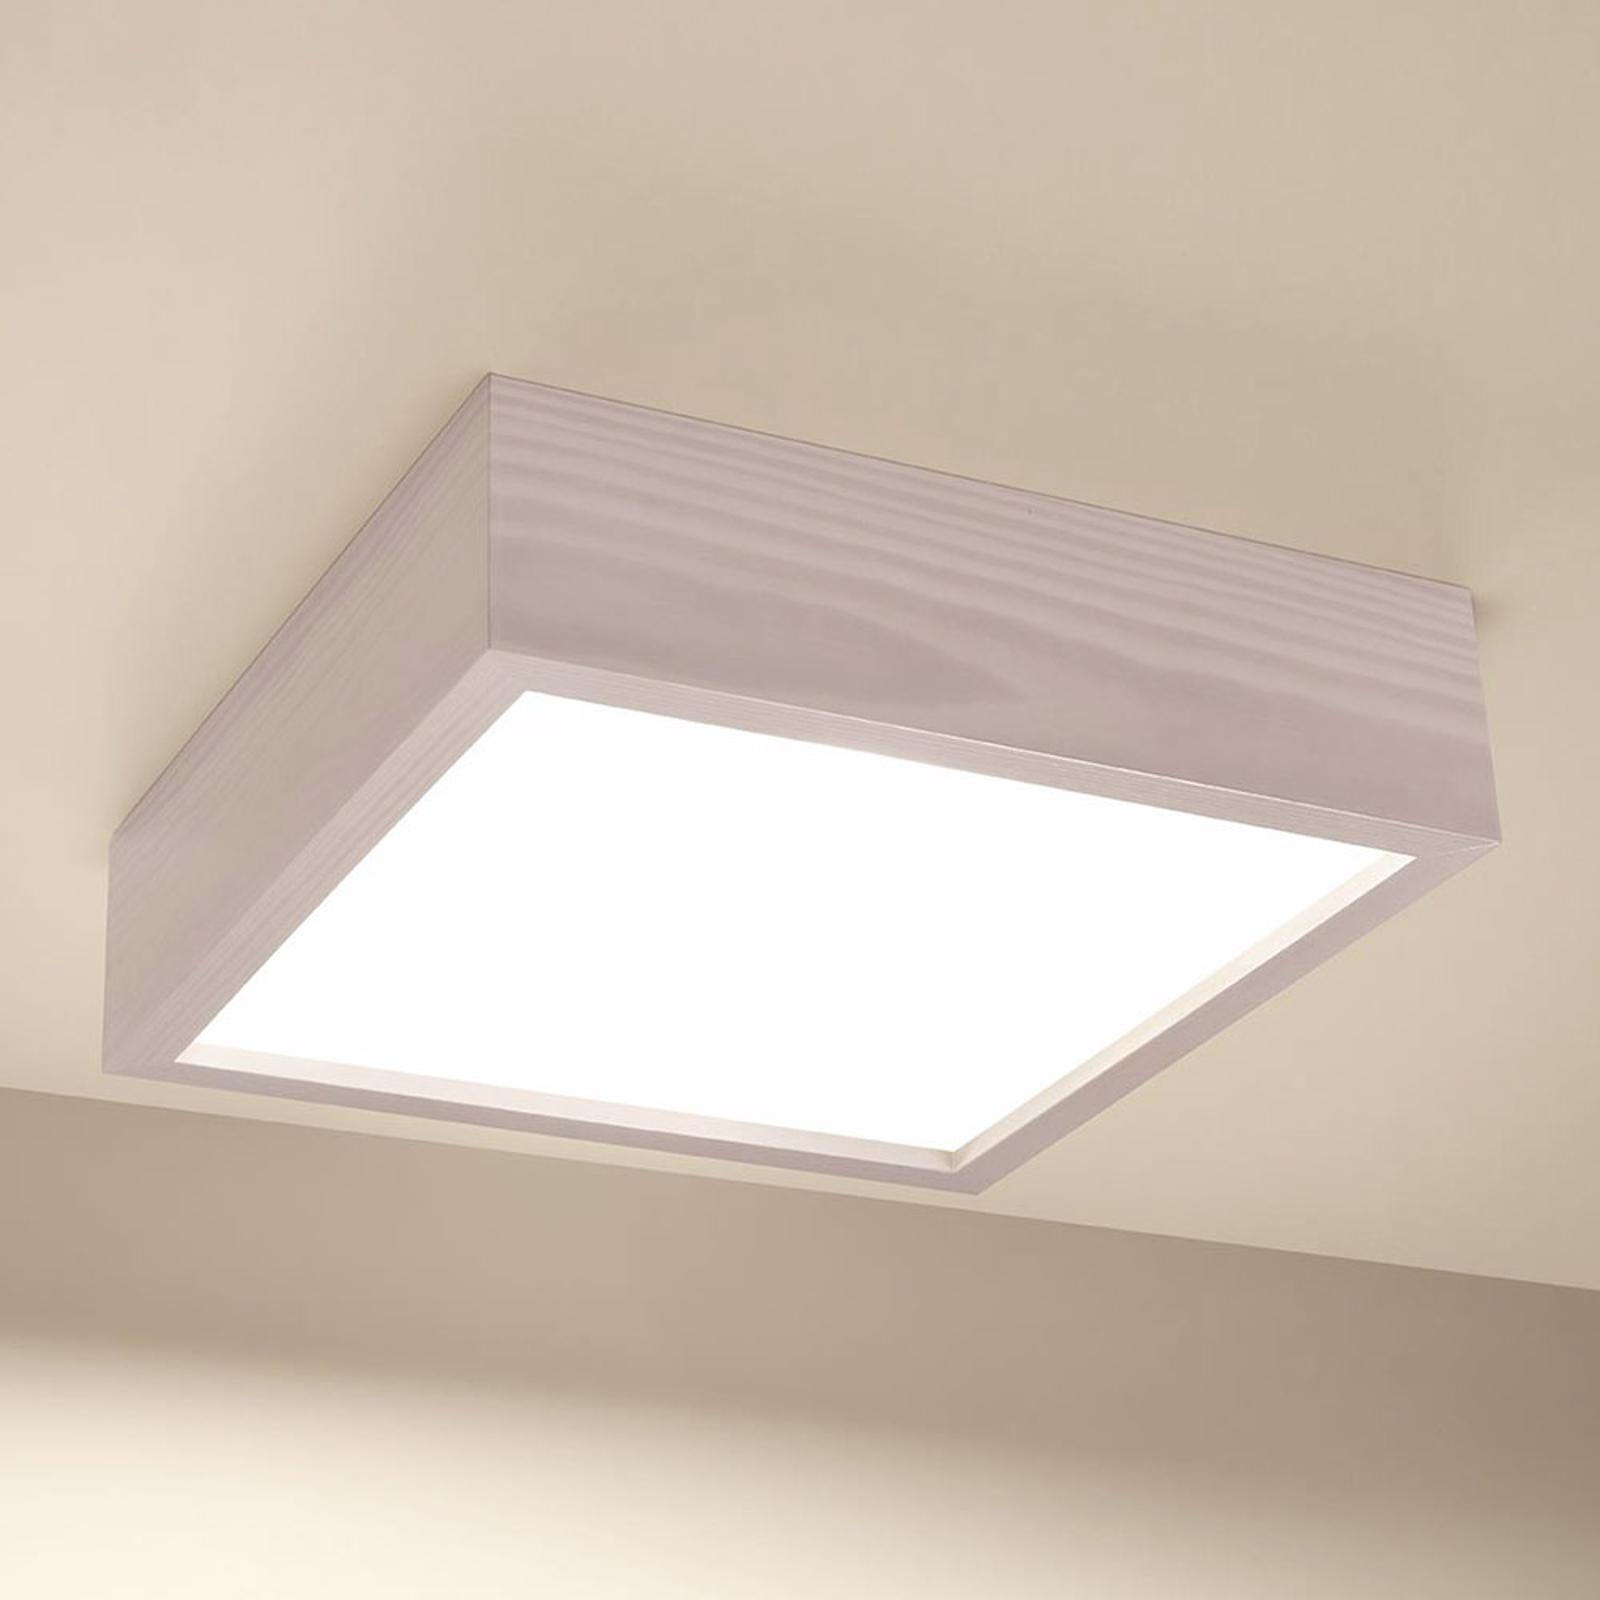 Madras taklampe eik Sonoma 30,5x30,5 cm